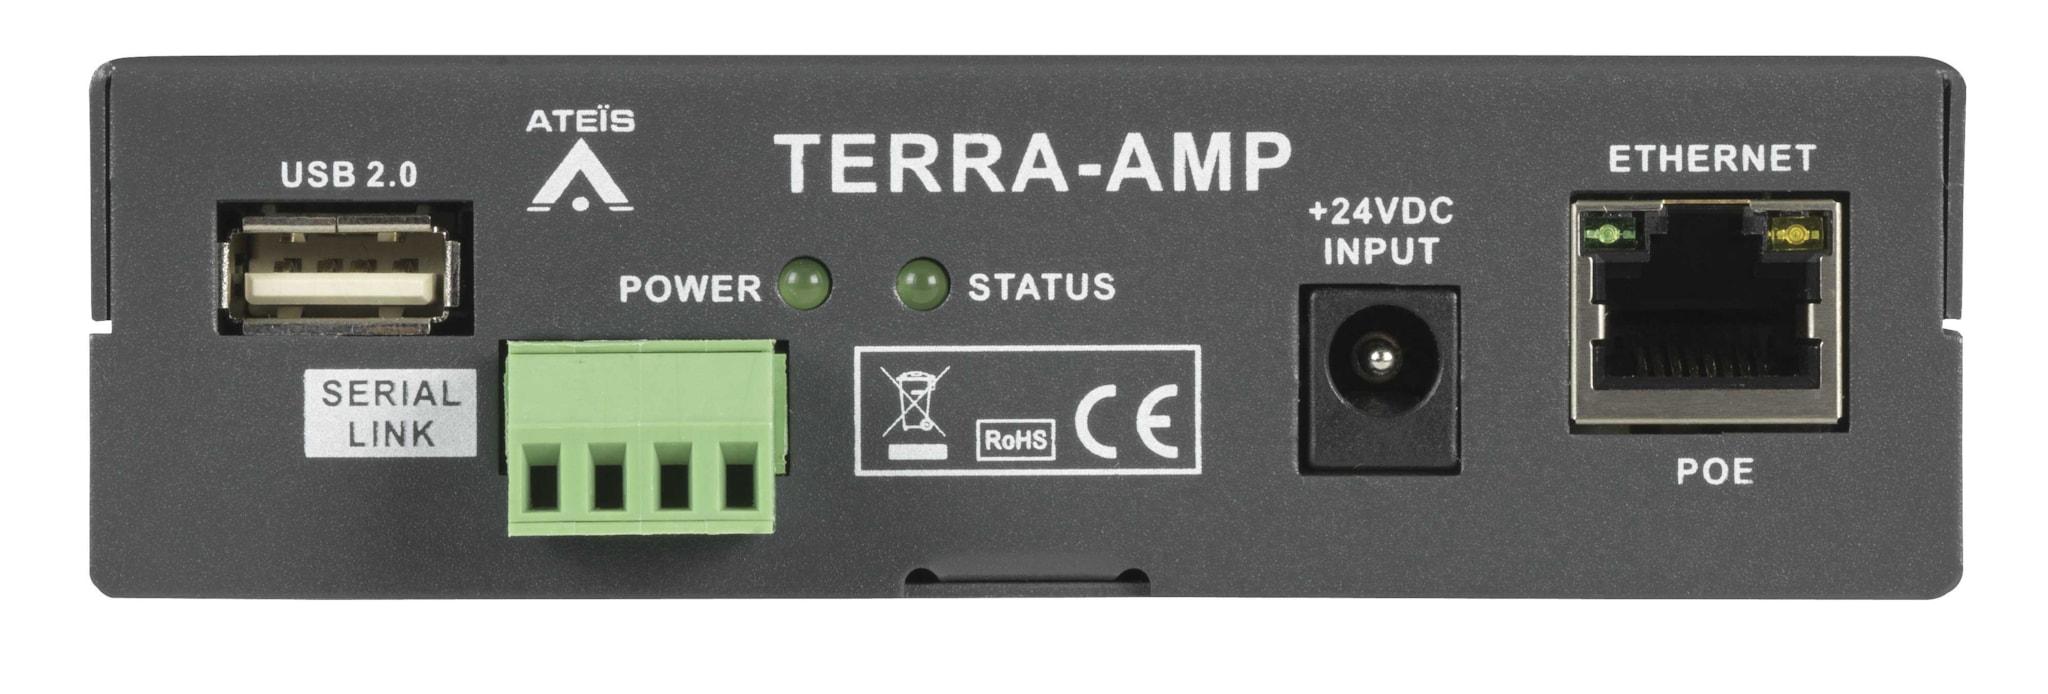 TERRA-AMP - Amplified IP terminal